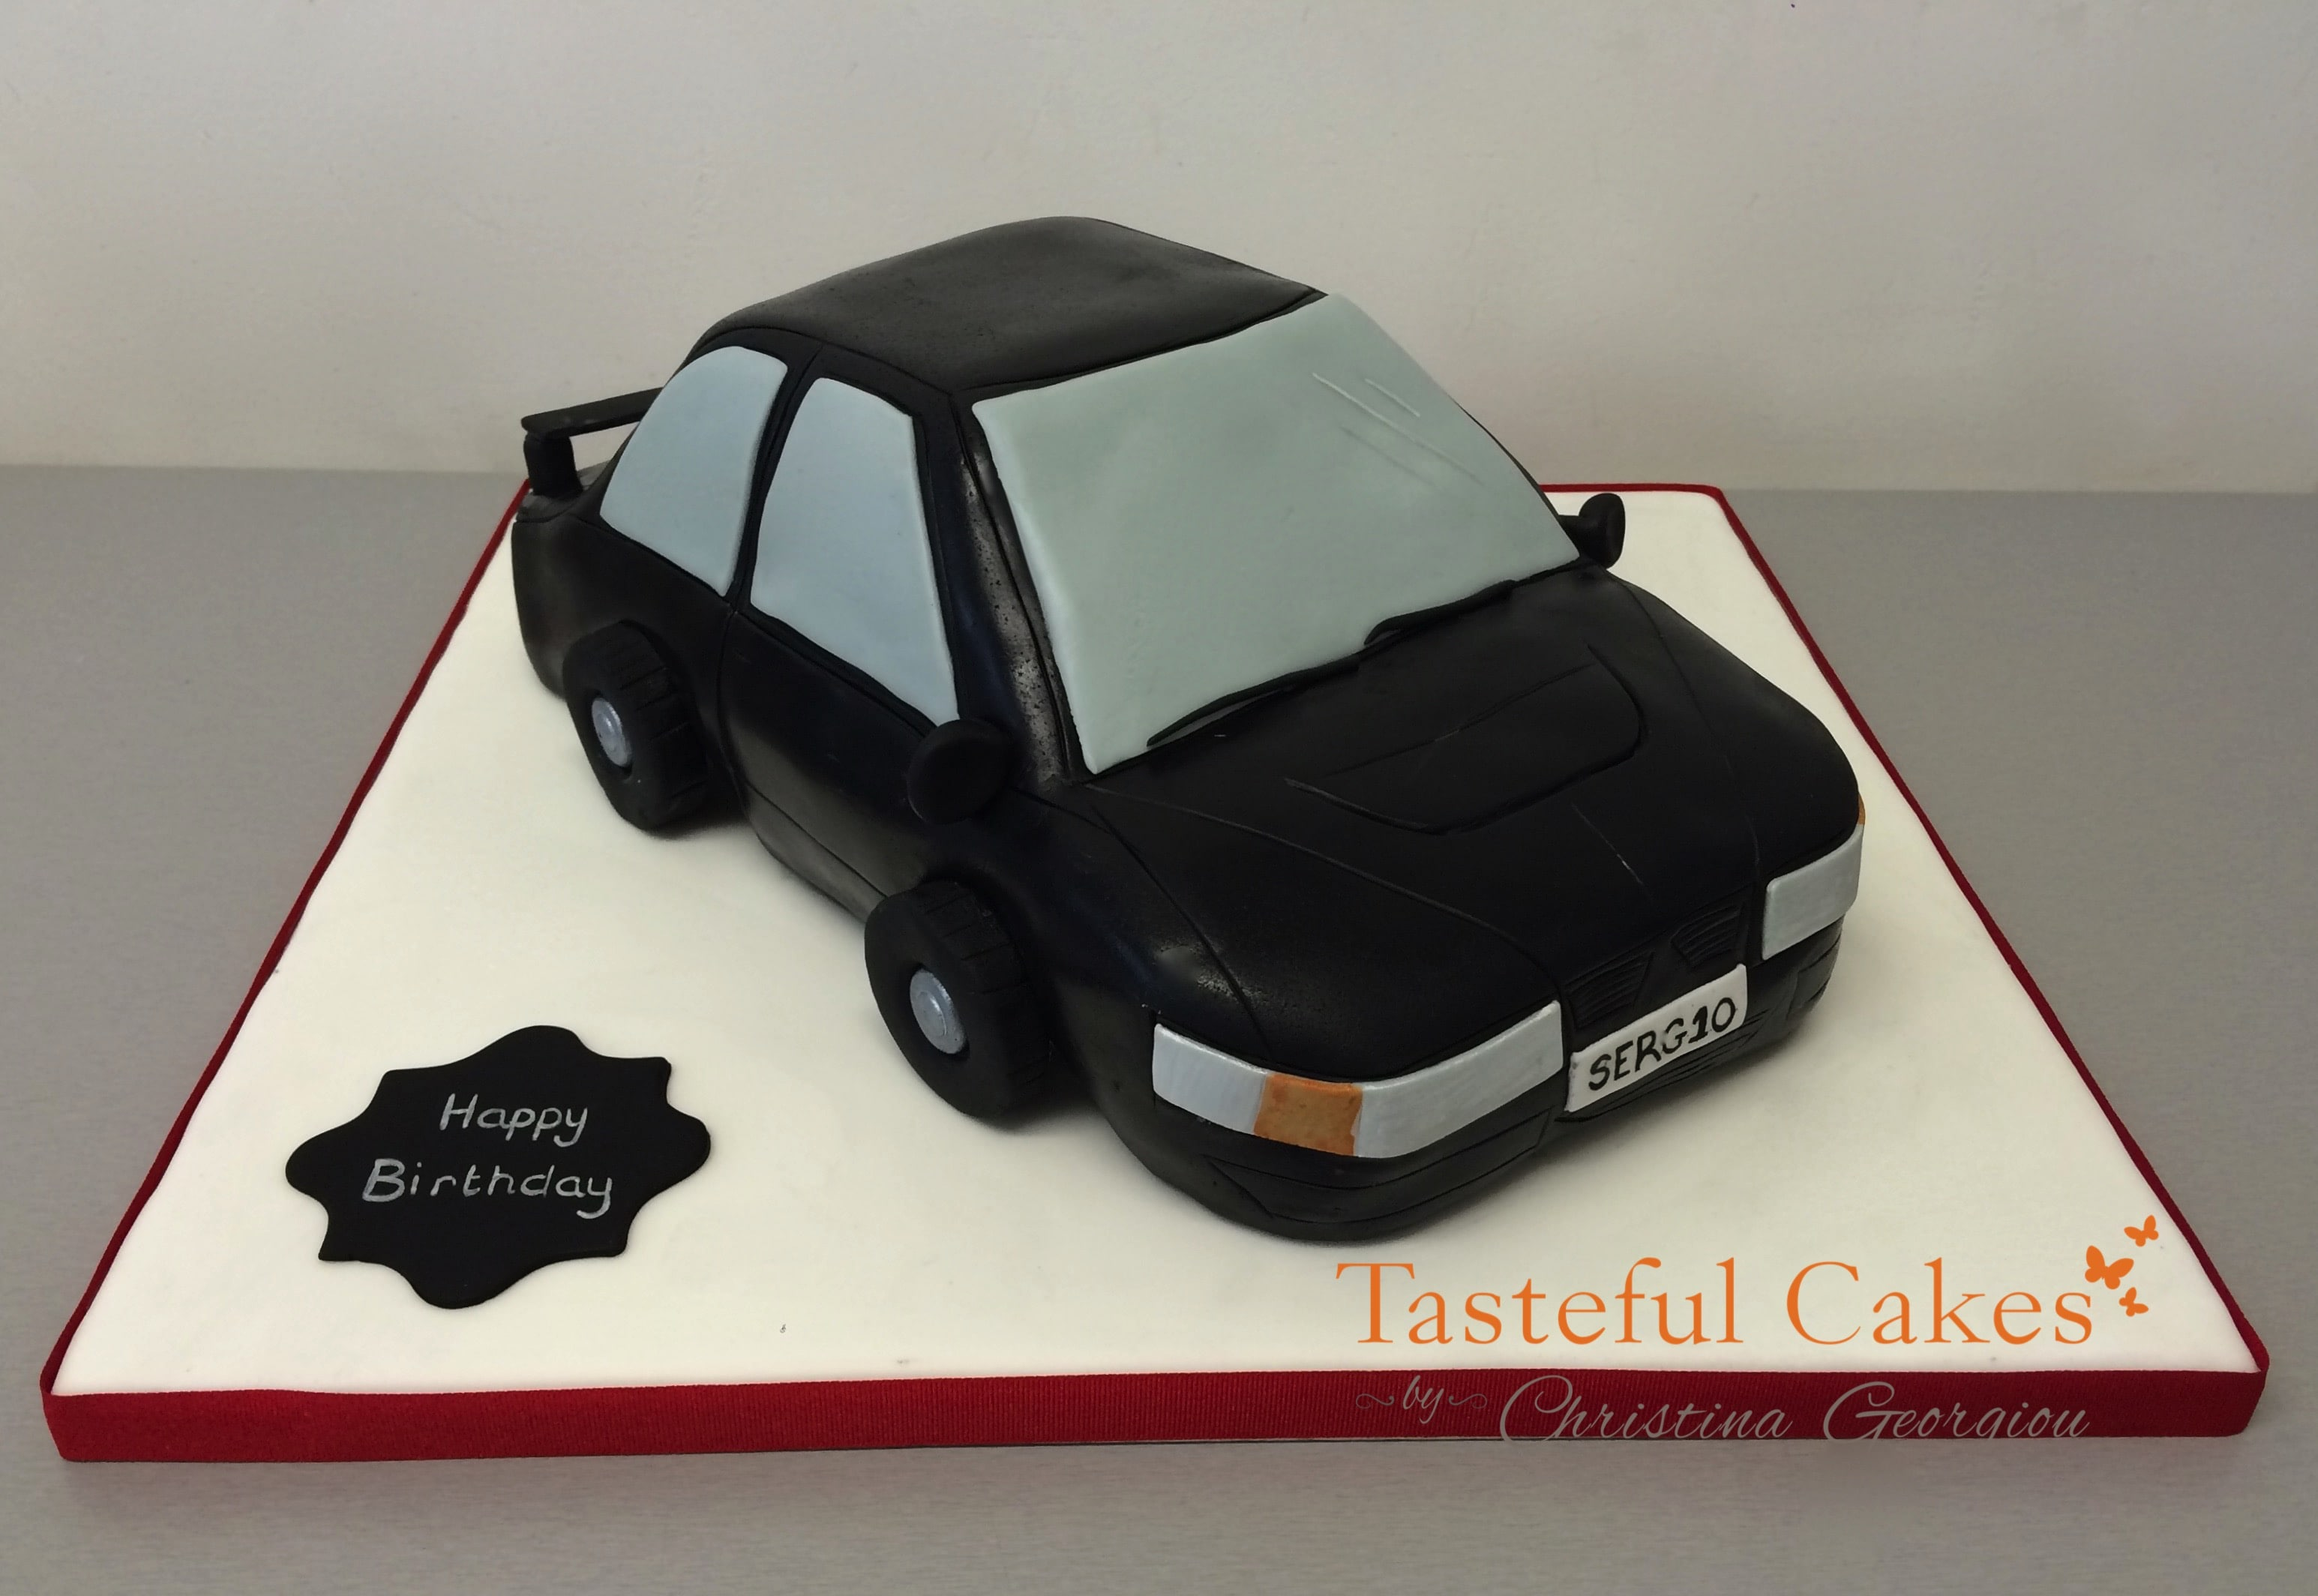 Tasteful Cakes By Christina Georgiou Black 3D Car Birthday Cake